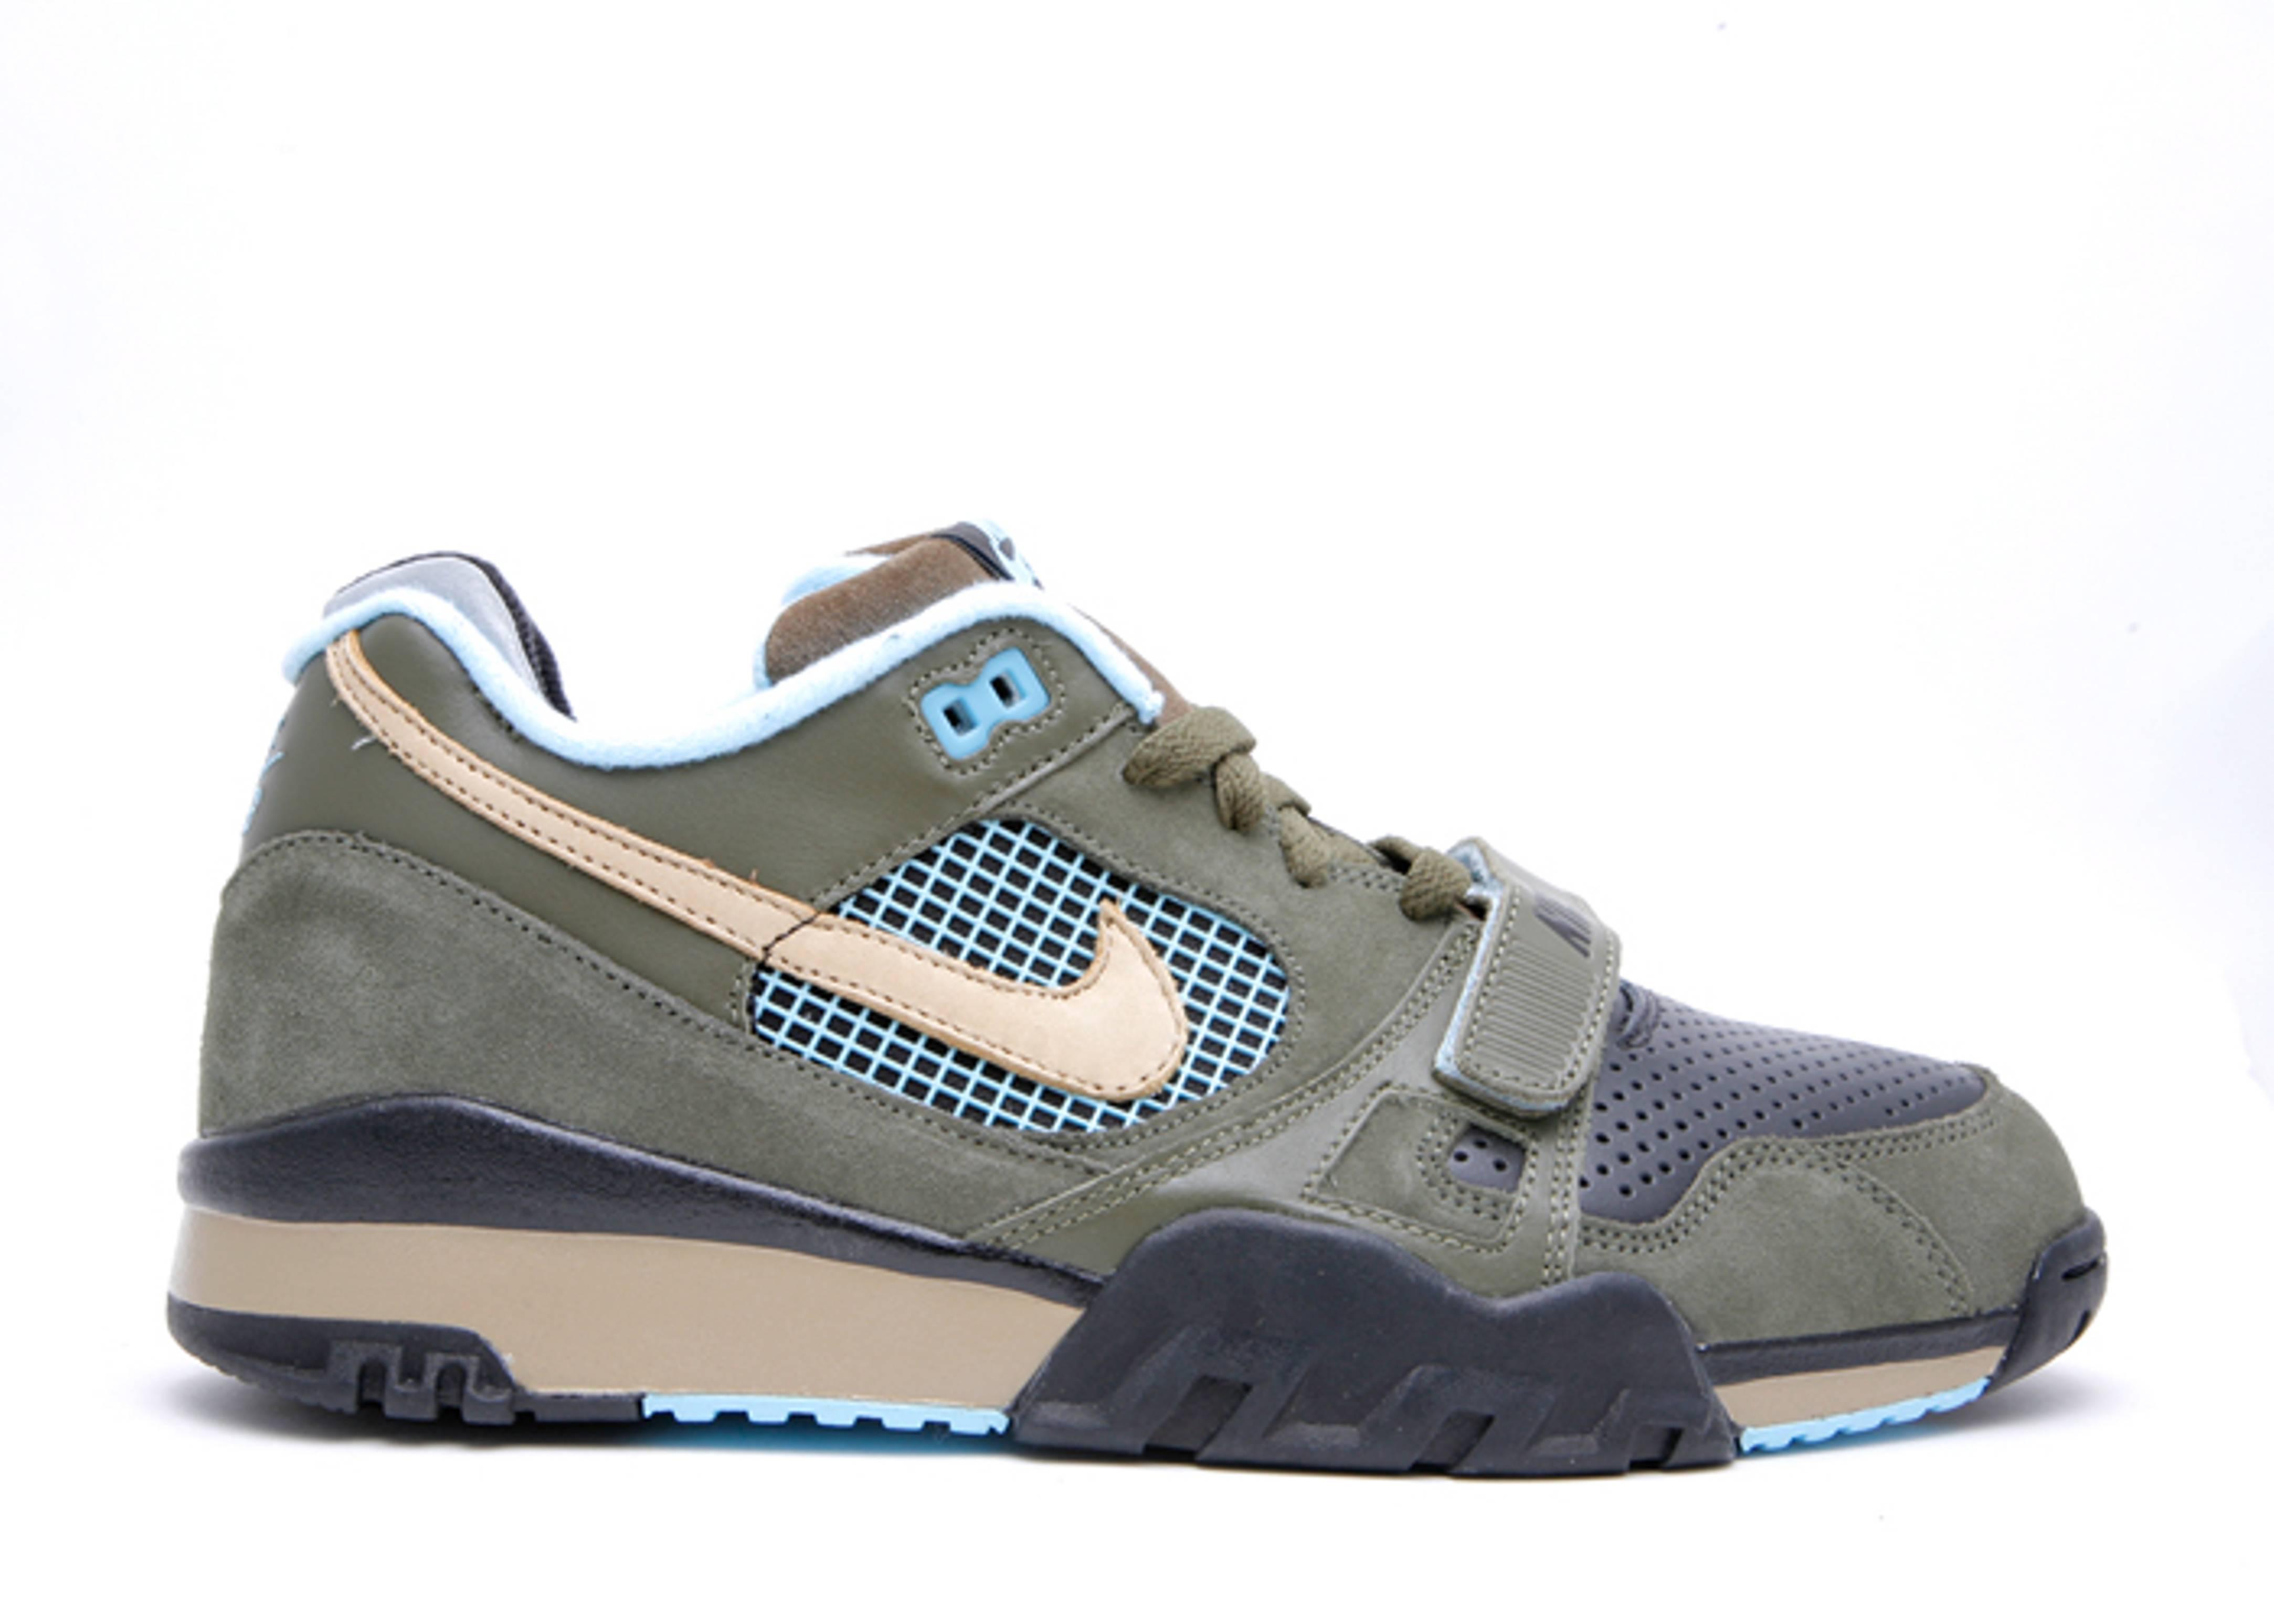 separation shoes 8be26 4d616 Air Trainer 2 Sb - Nike - 318480 321 - urban haze/tweed ...